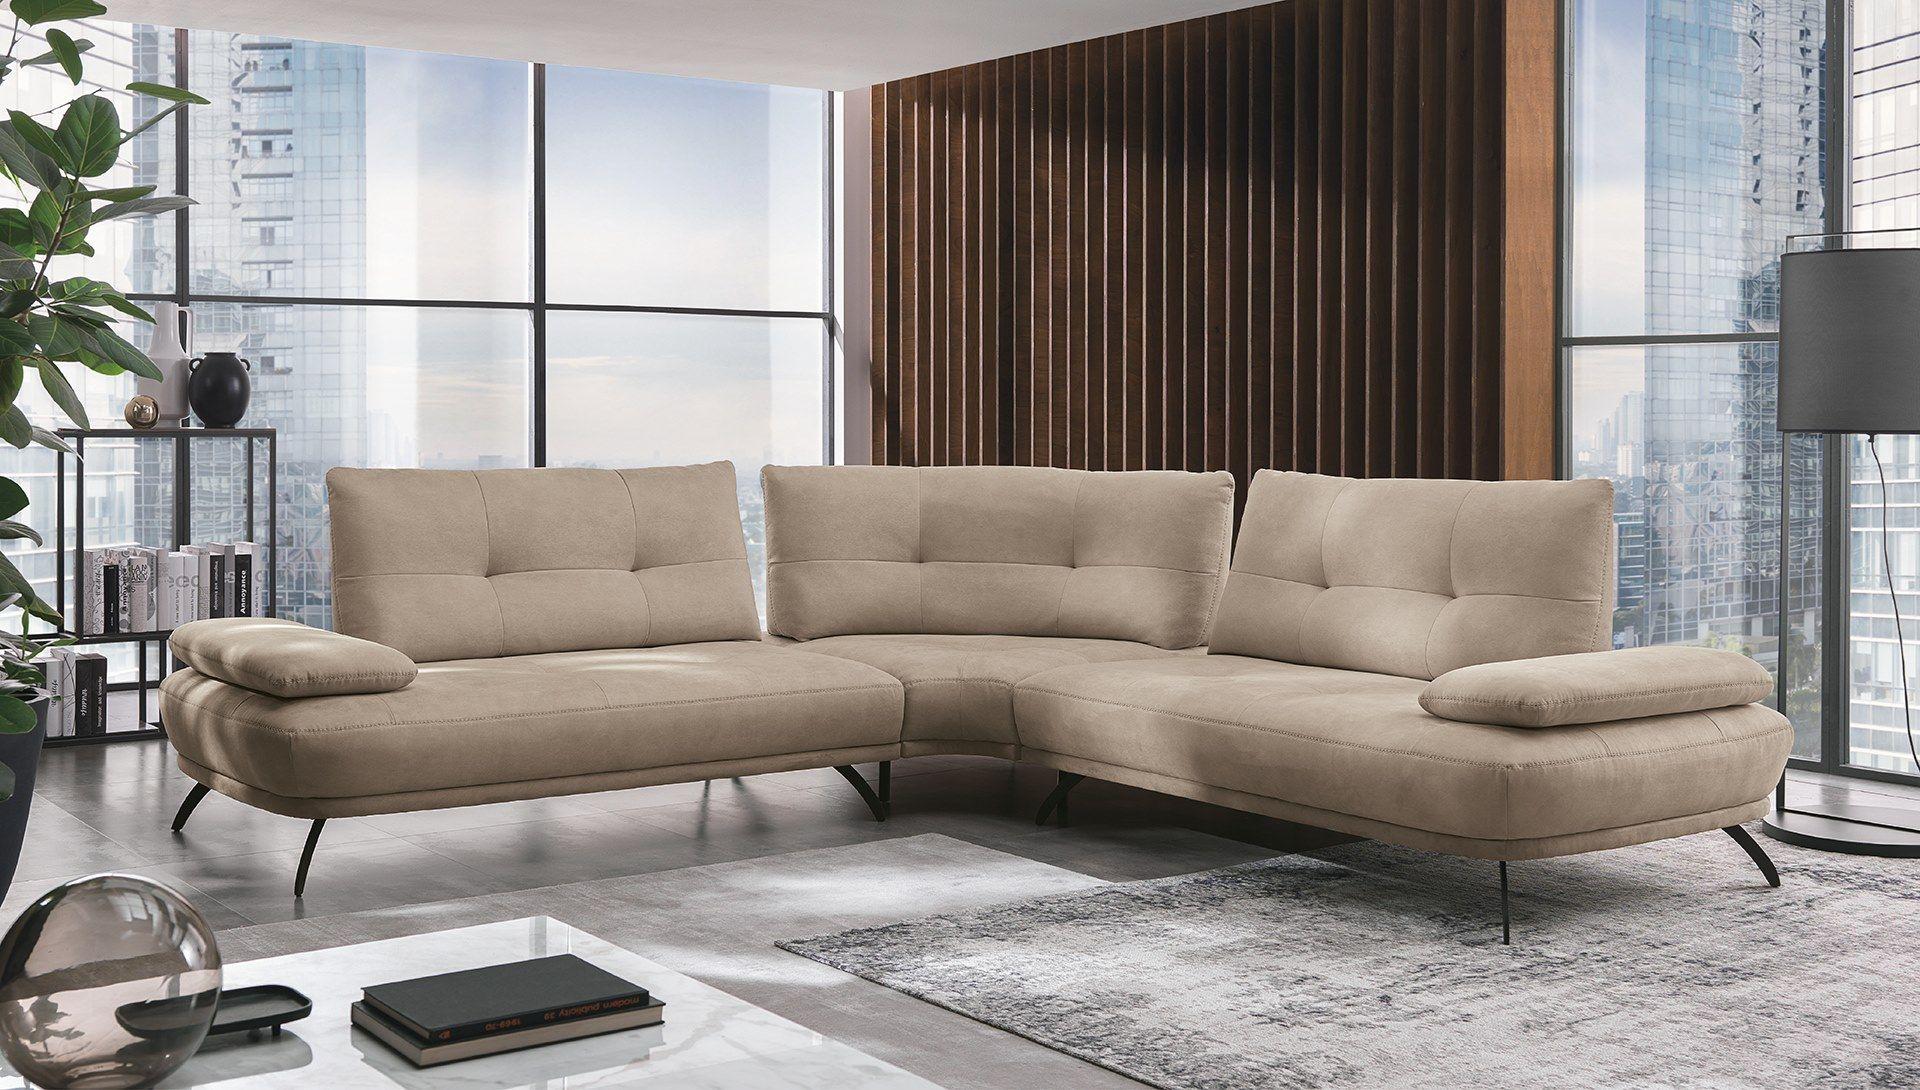 Corner sectional fabric sofa bogart by max divani in 2020